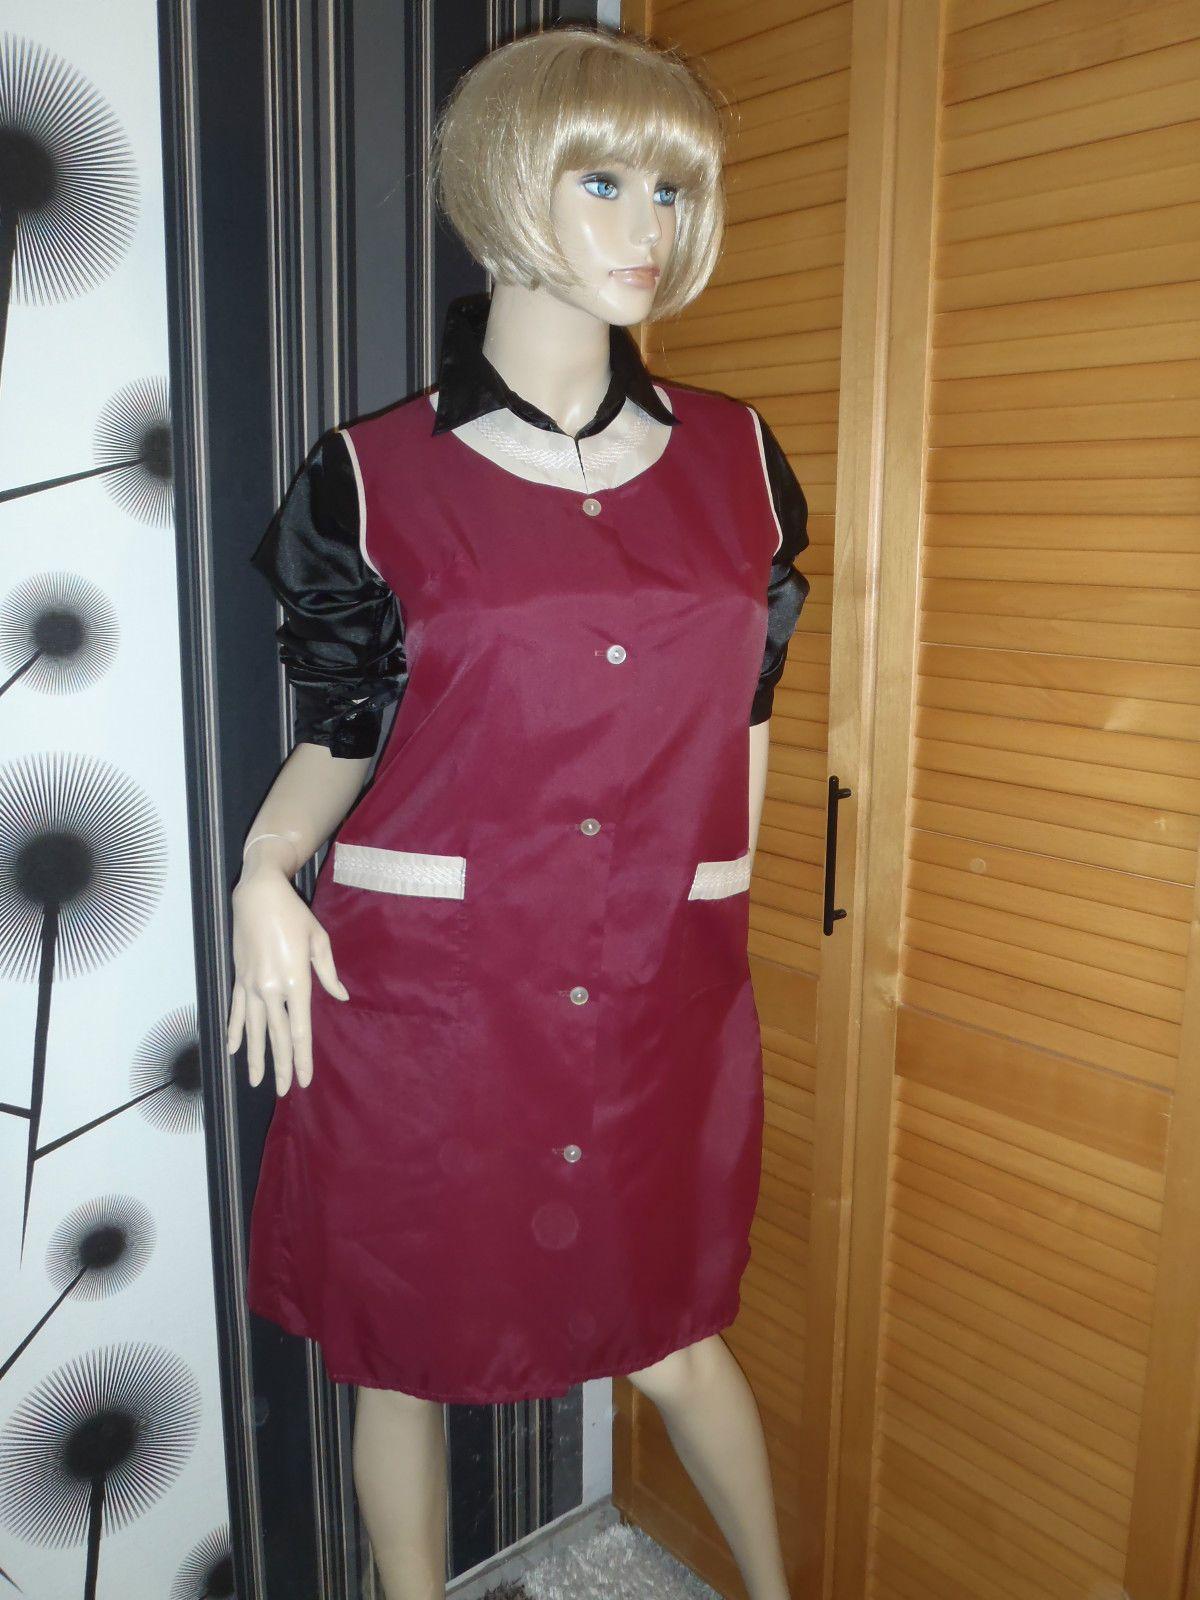 Nylon Kittel Schürze Vintage Glanz Kleid Blouse Sissy Boy ...